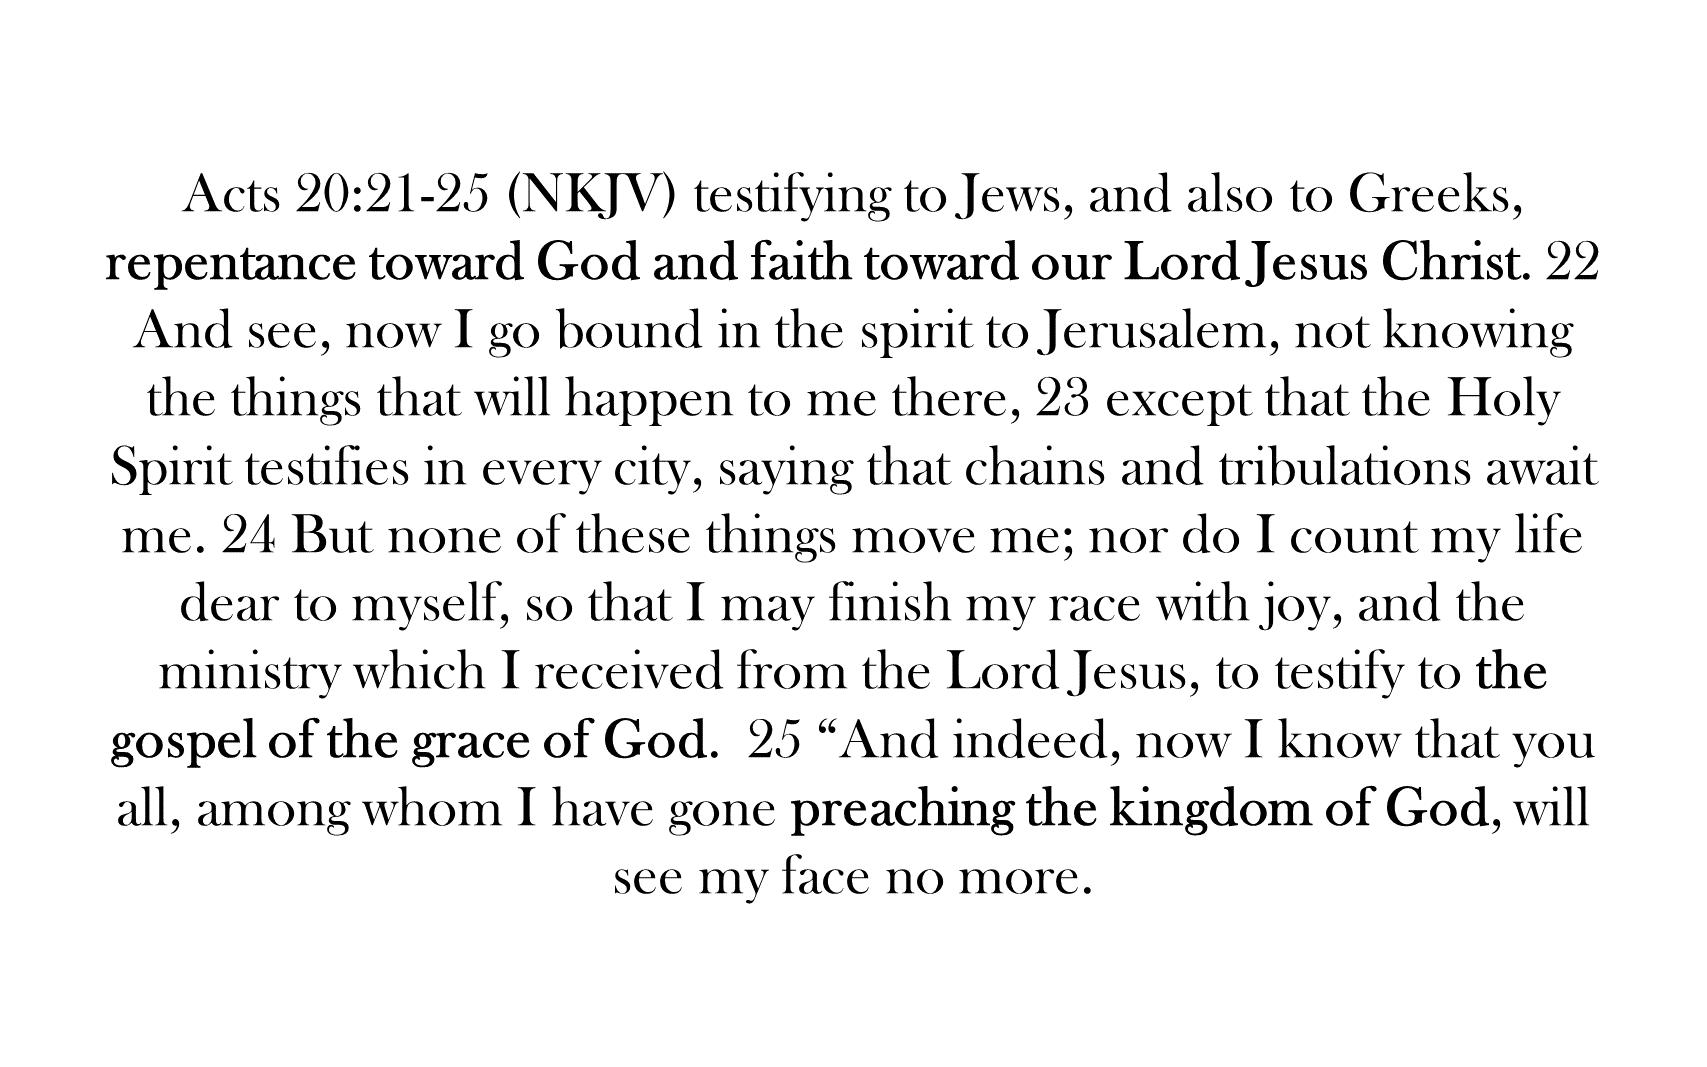 ESH-20 - The Discipline Of Disciple-Making - Seeing, Understanding, Entering, Living, & Seeking The Kingdom Of God ( (10)